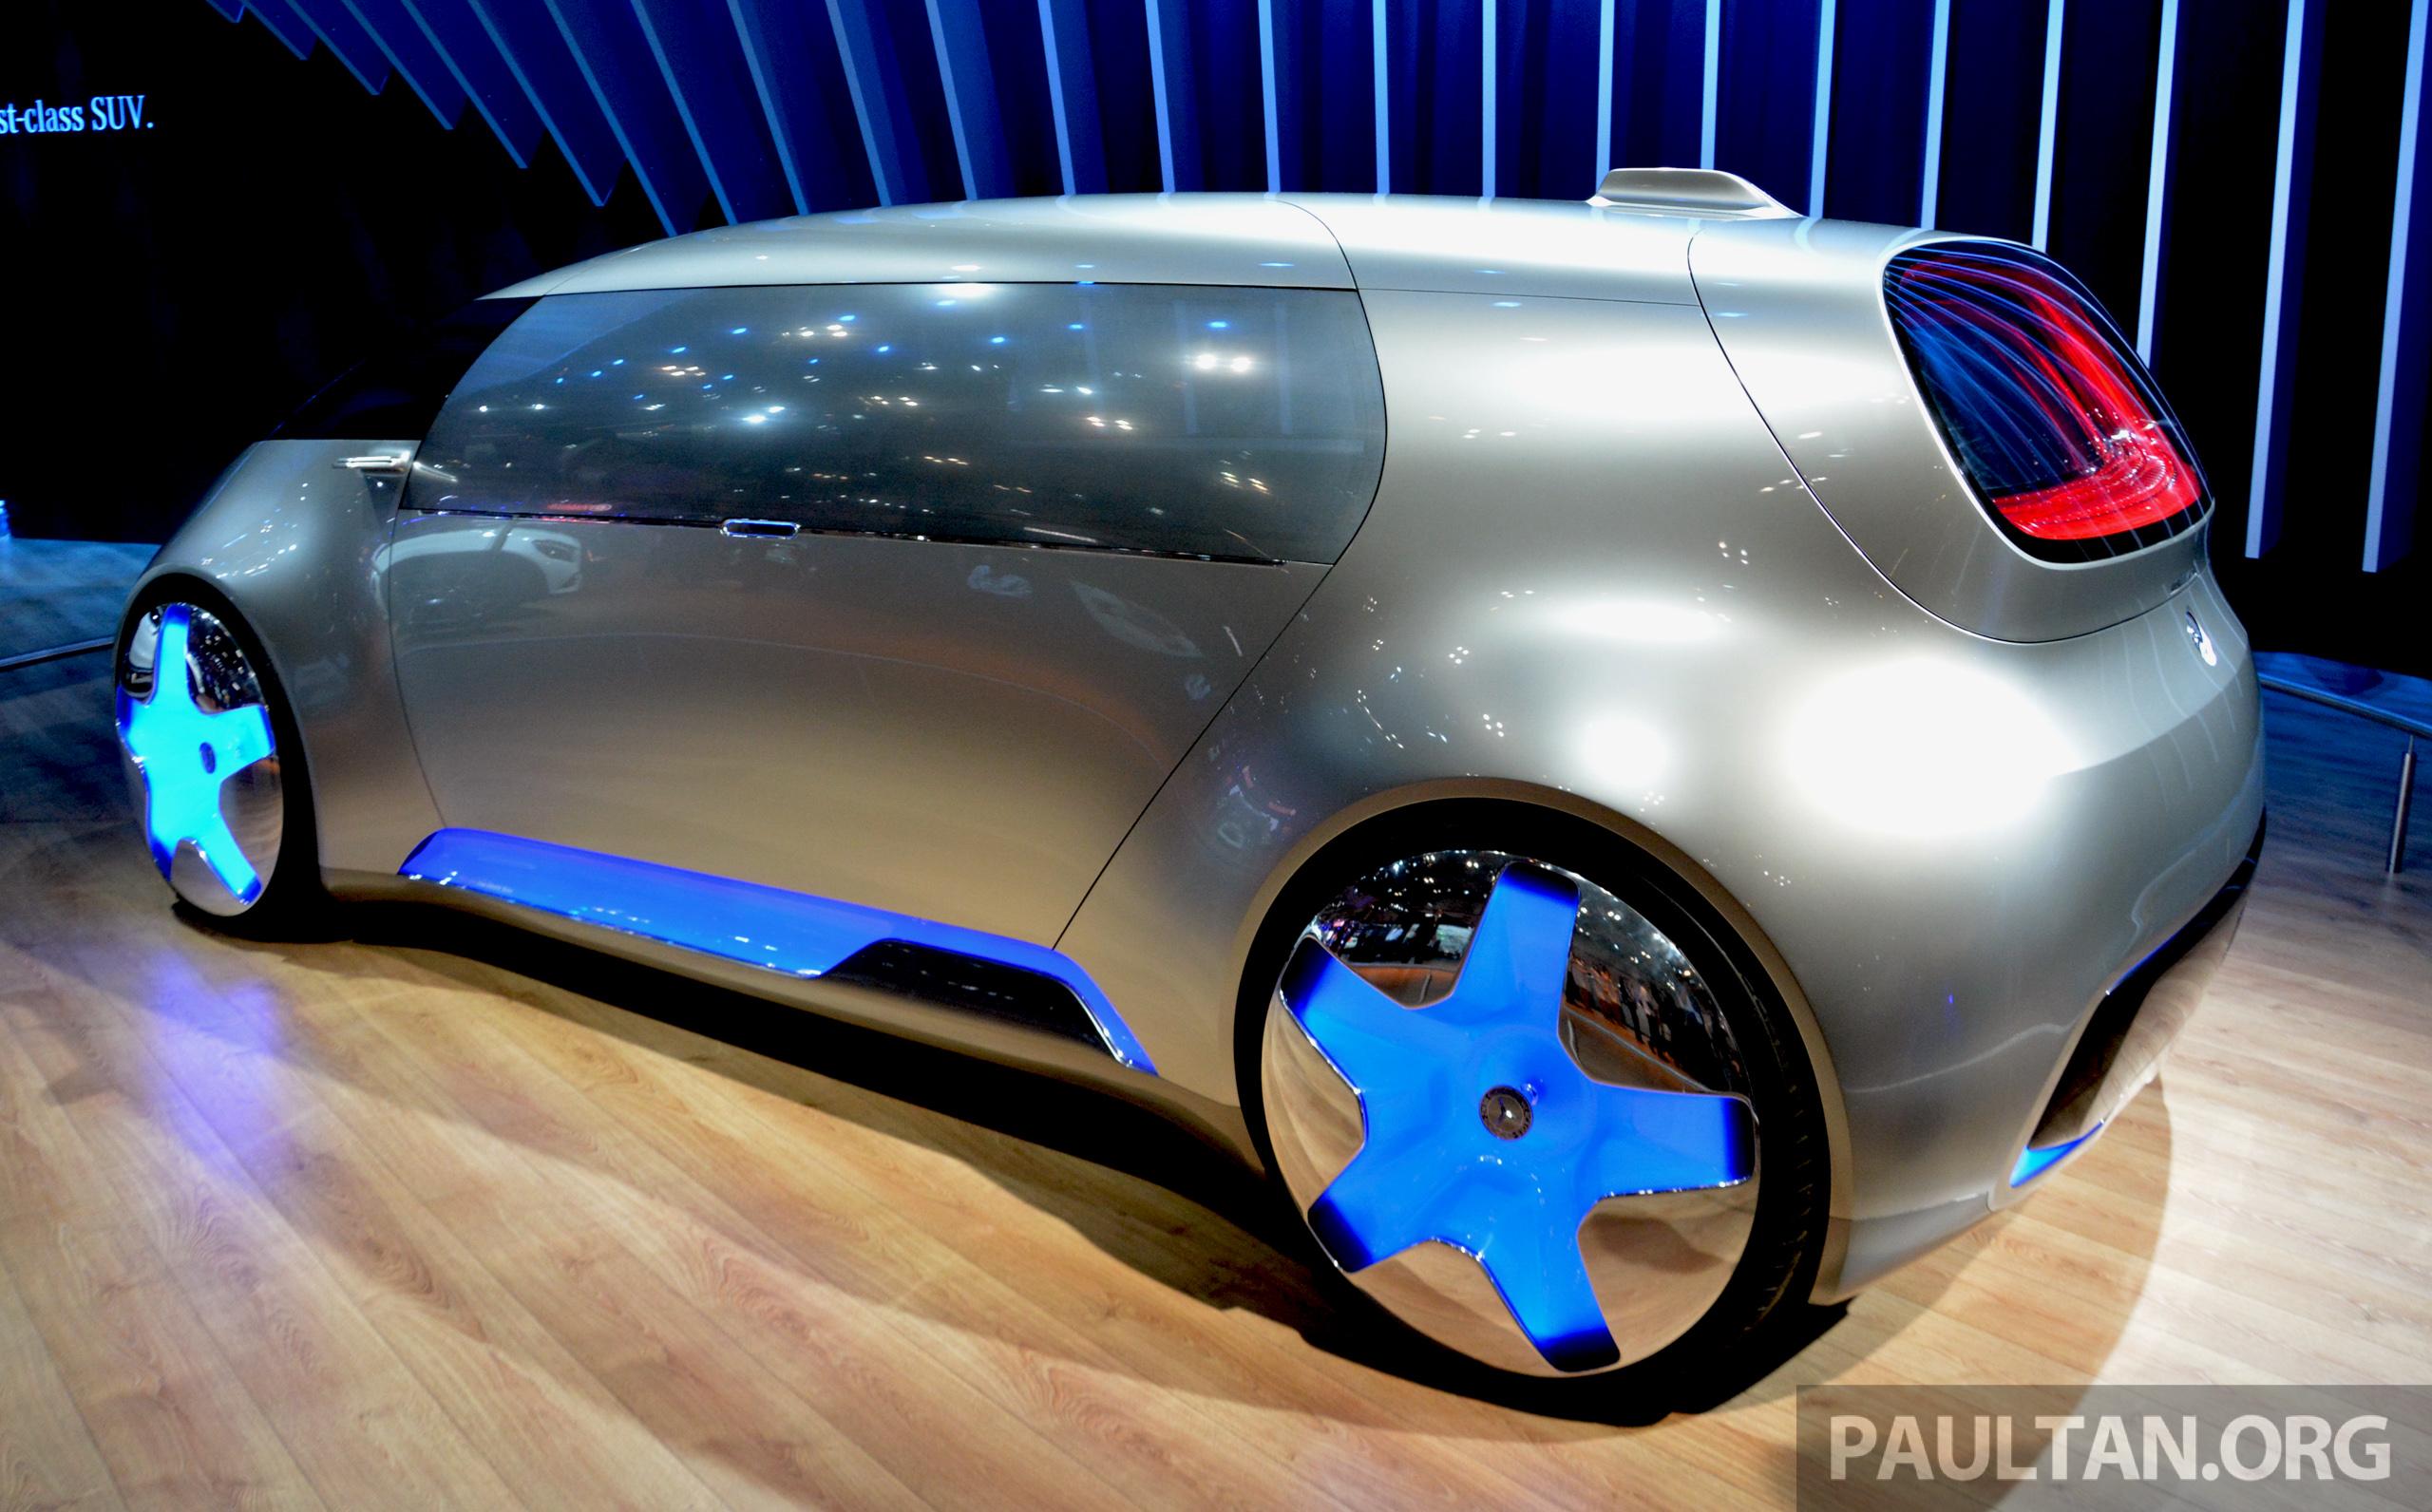 https://s1.paultan.org/image/2015/10/Mercedes-Benz-Vision-Tokyo-TMS-8.jpg